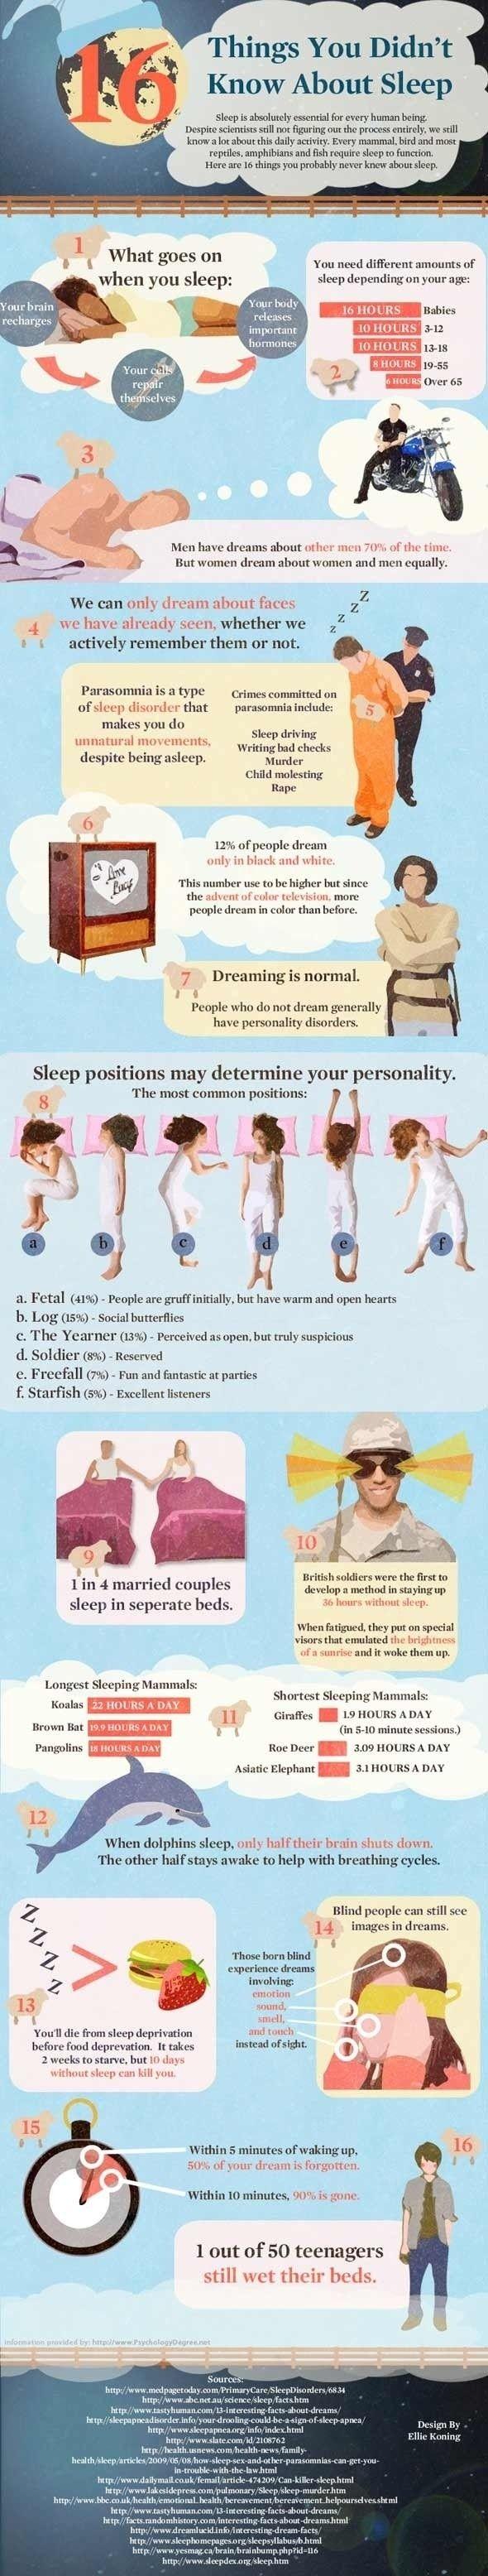 Sleep facts - now I just wish I'd get some sleep myself.